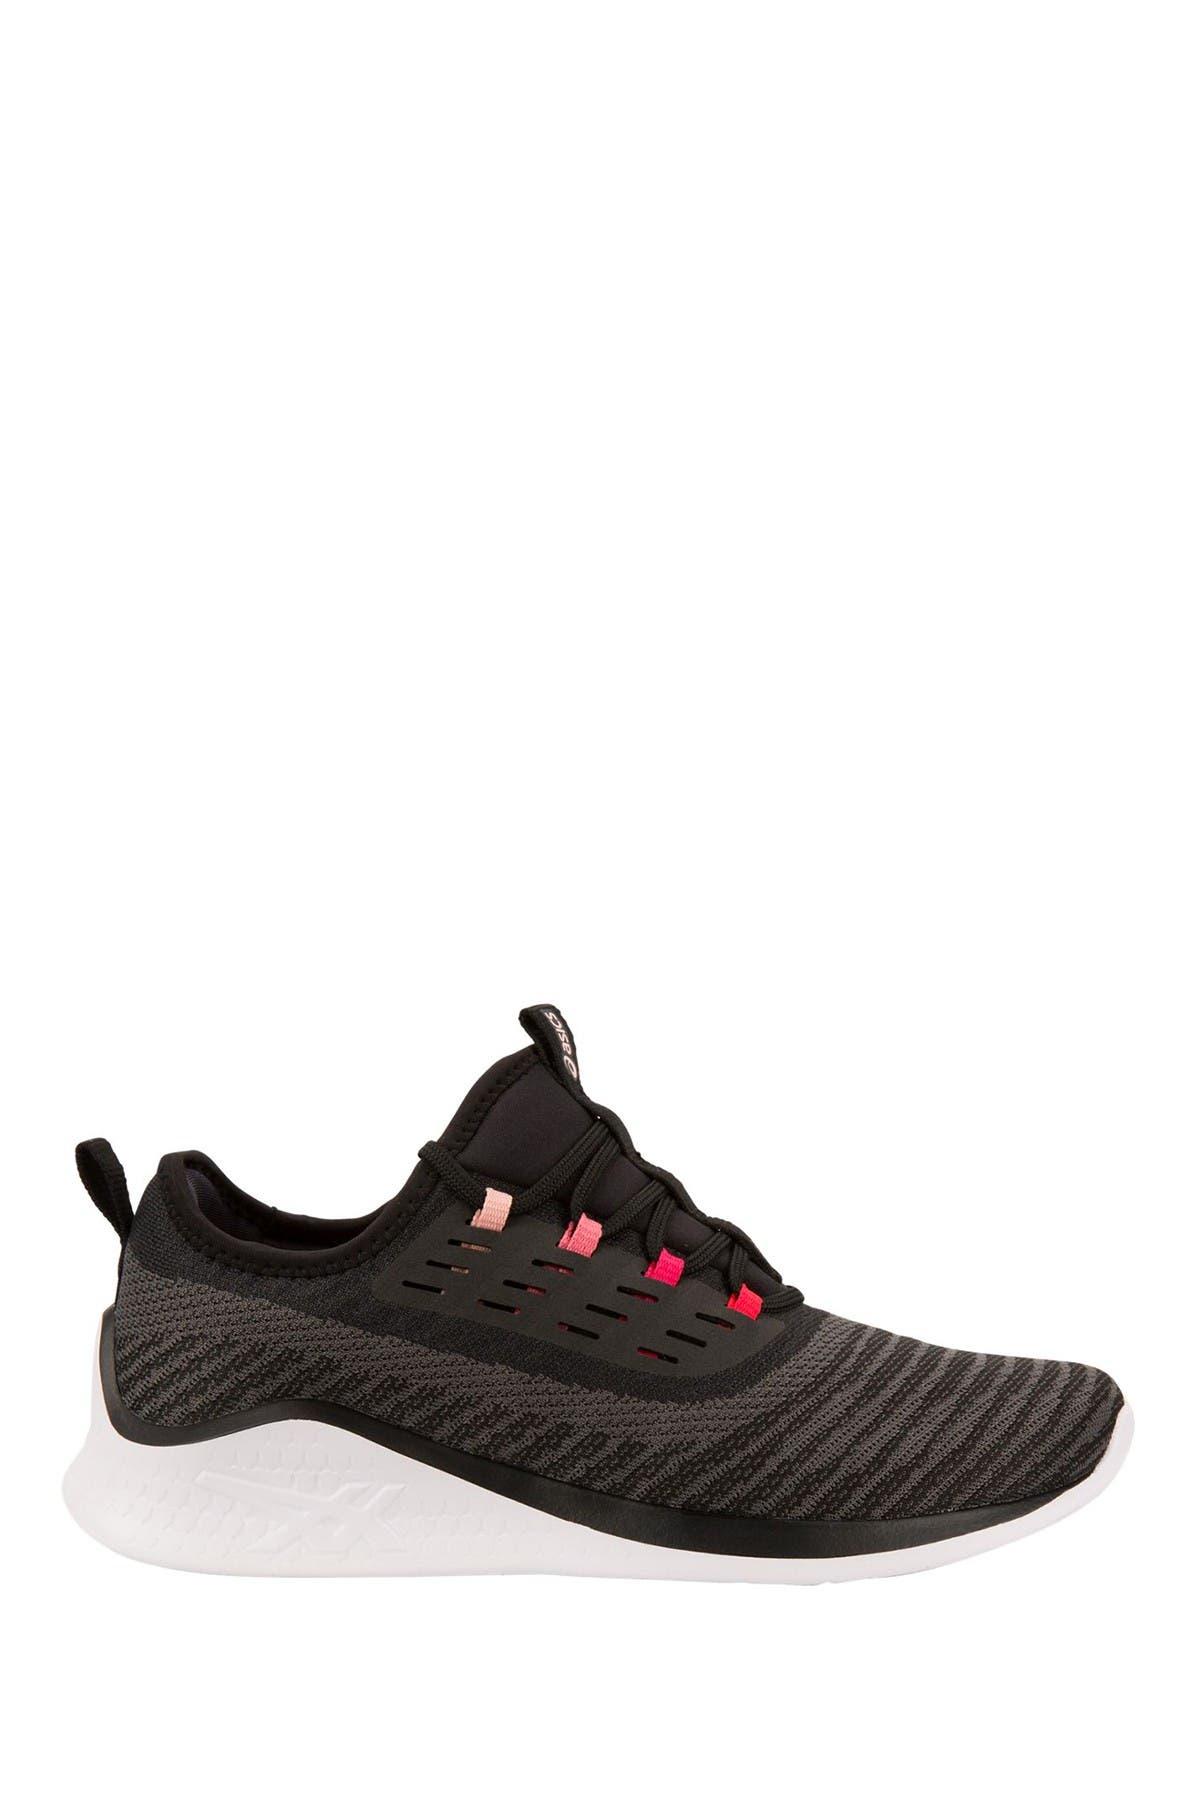 ASICS | Fuzetora Twist Sneaker | HauteLook